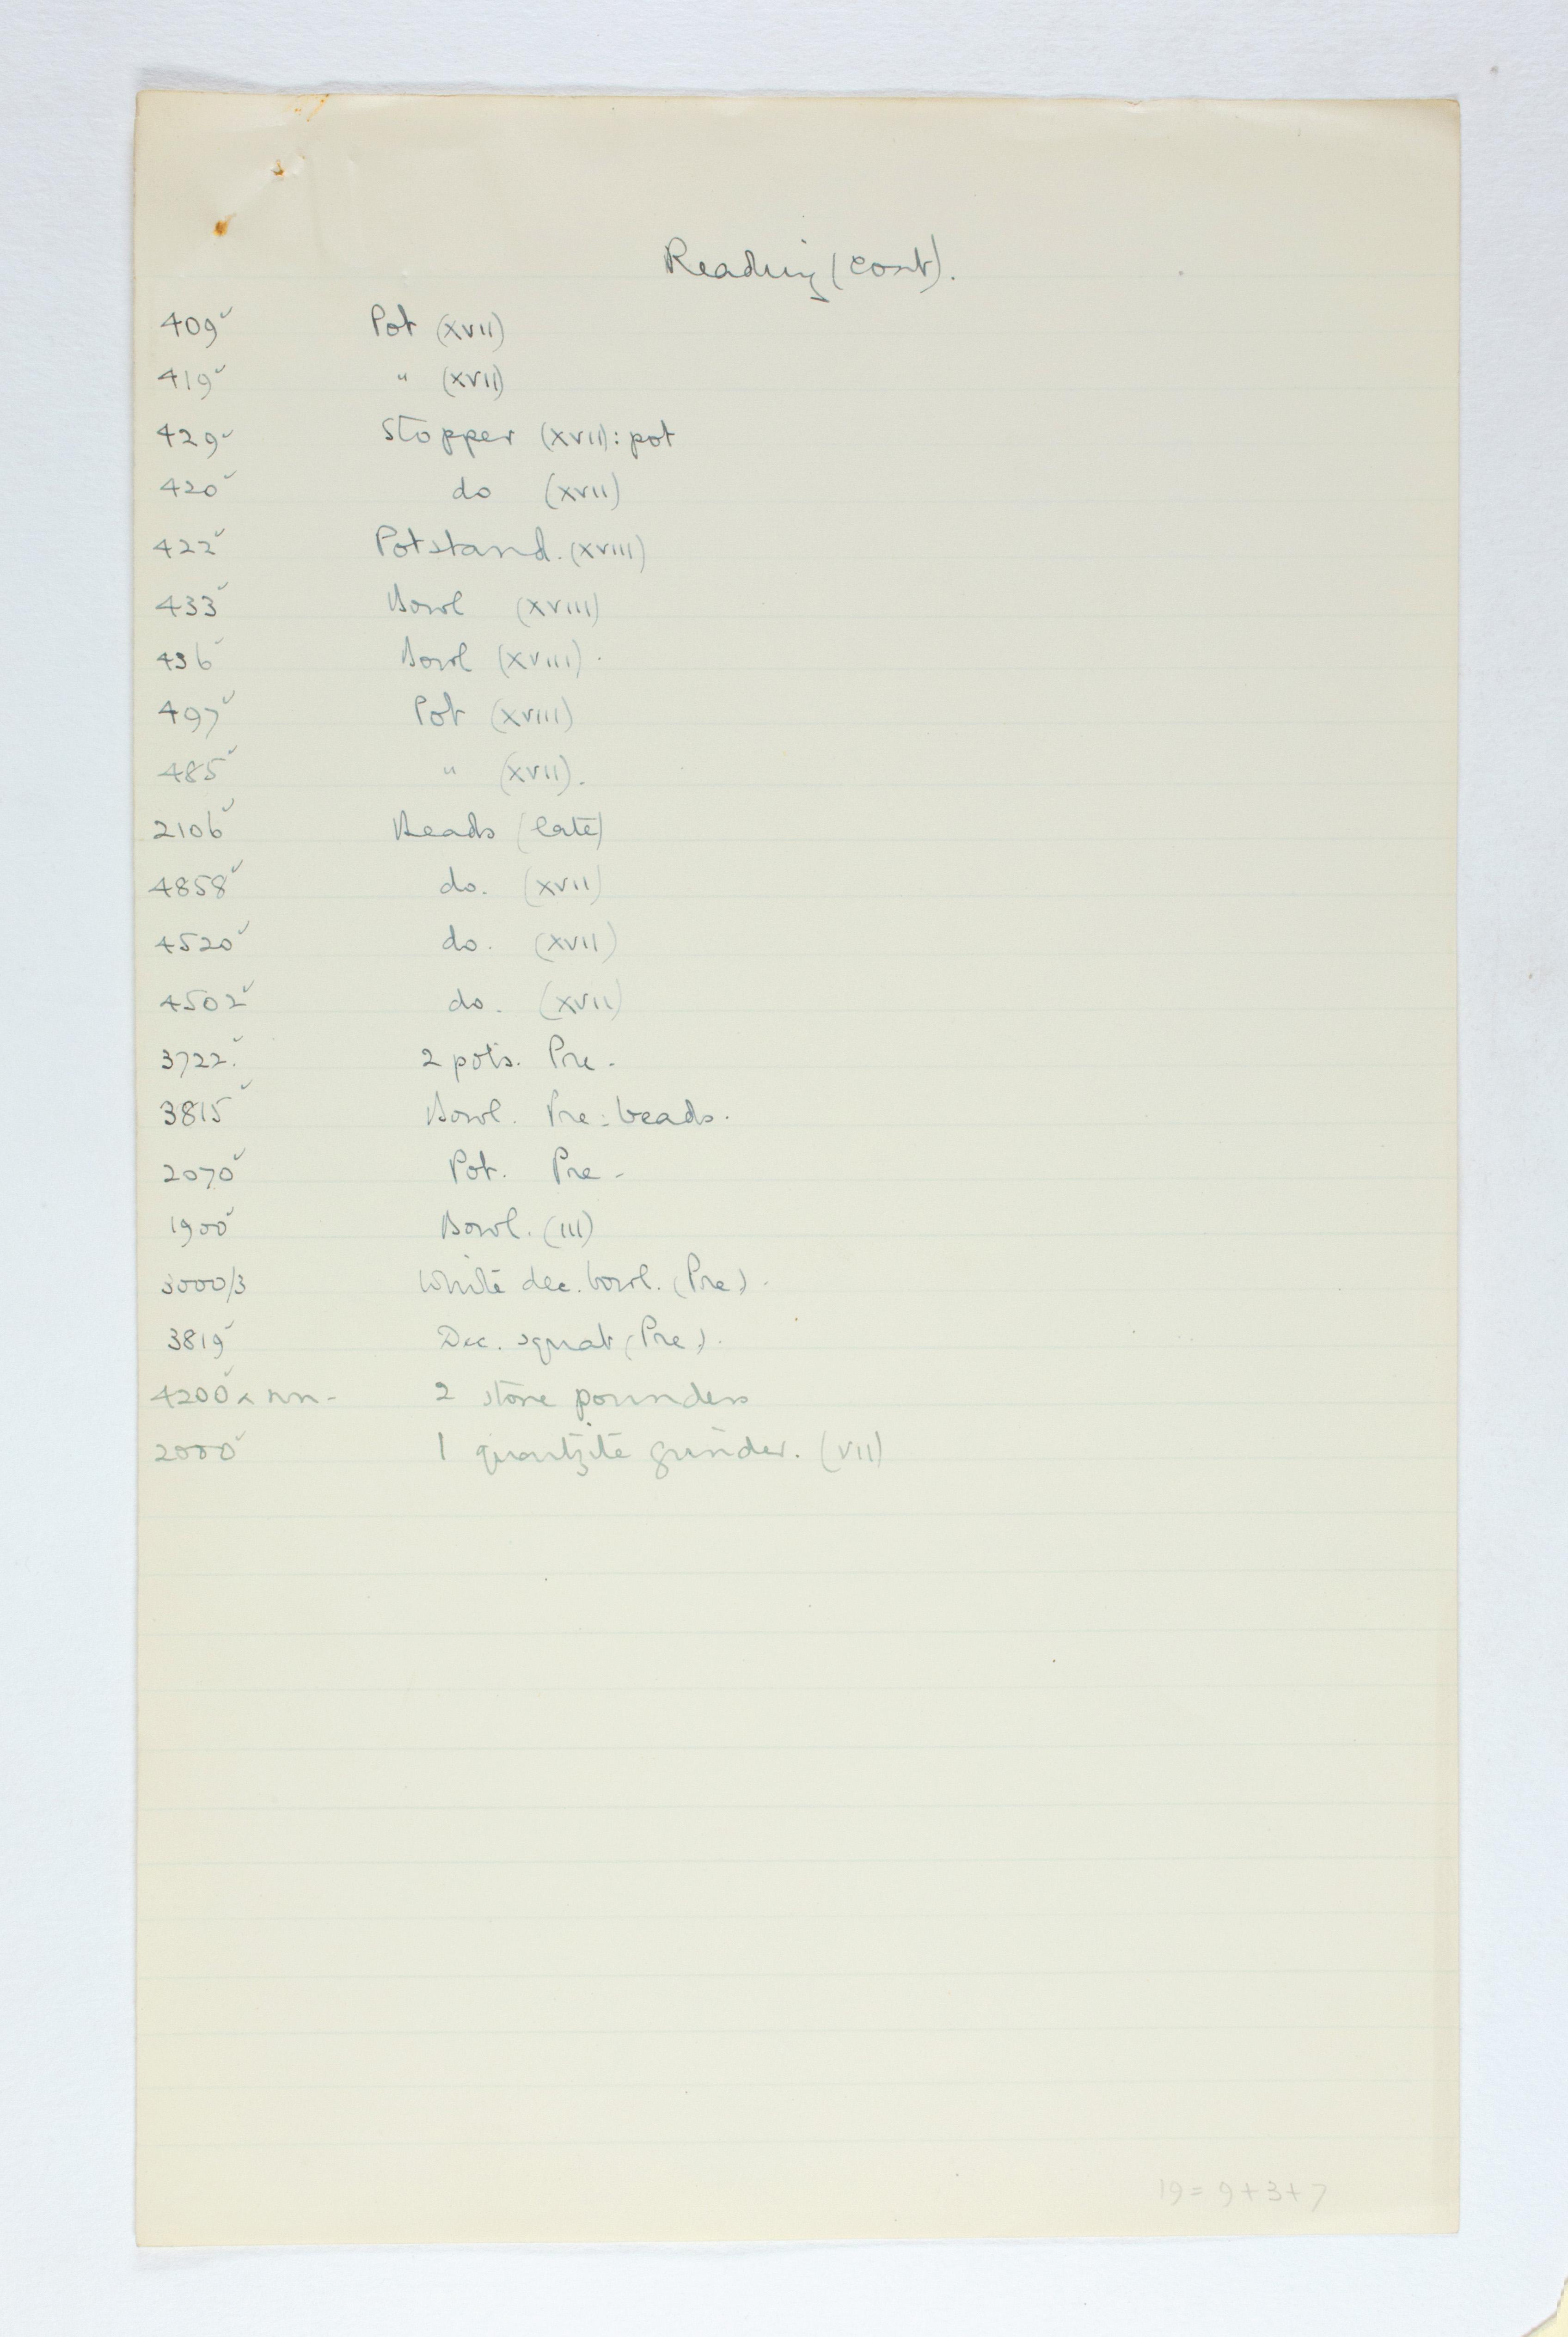 1923-24 Qau el-Kebir, Hemamieh Individual institution list PMA/WFP1/D/27/24.2